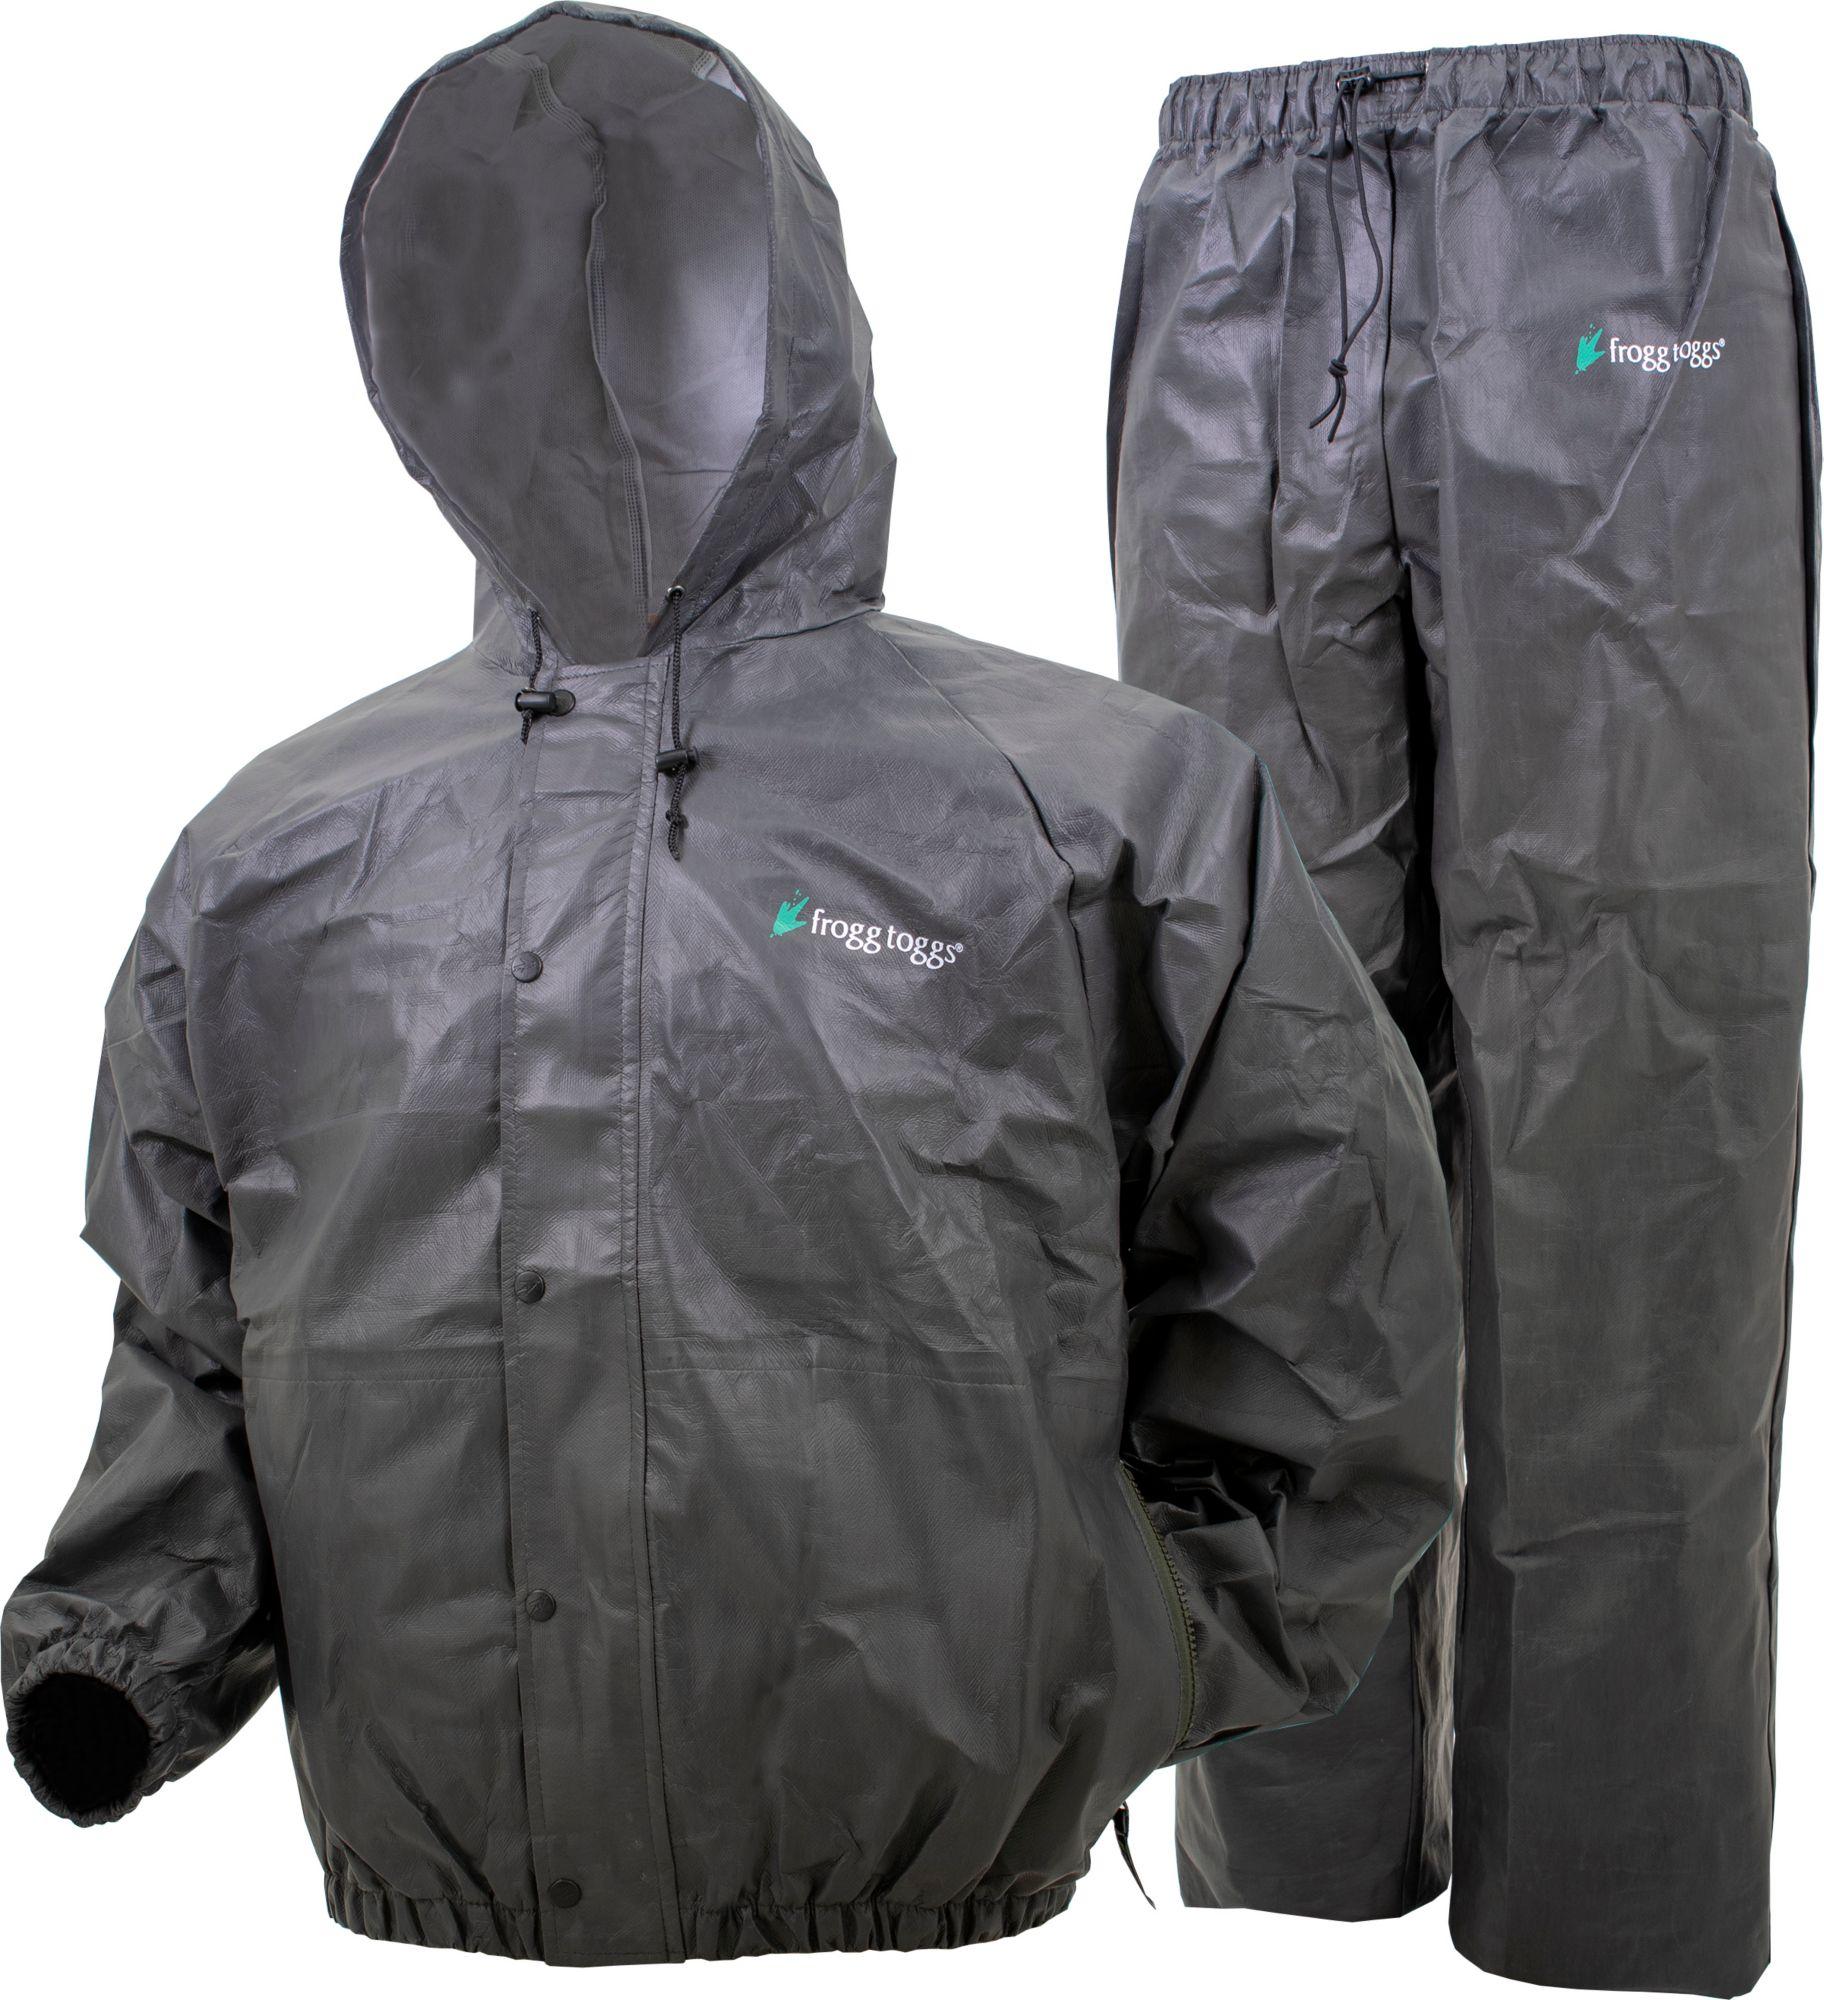 Frogg Toggs Men's Pro Action II Rain Suit, Size: Medium, Grey thumbnail